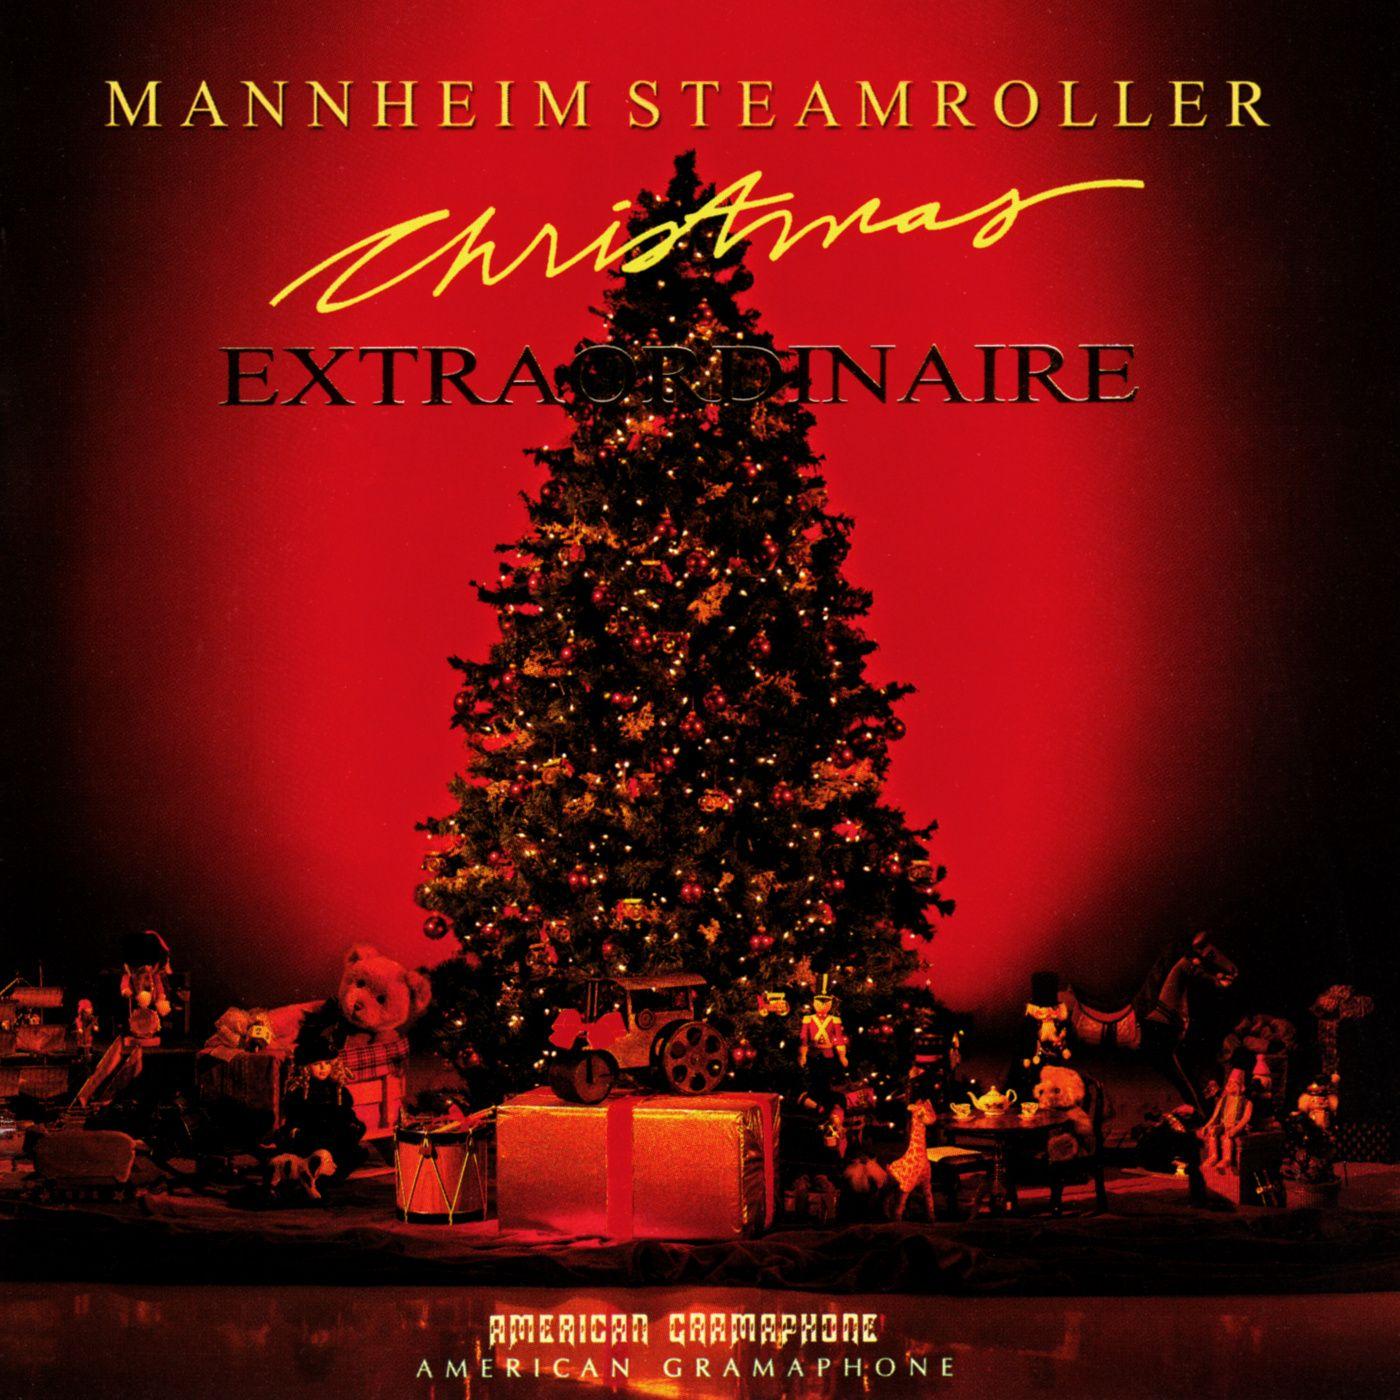 Christmas Extraordinaire by Mannheim Steamroller - Music Charts